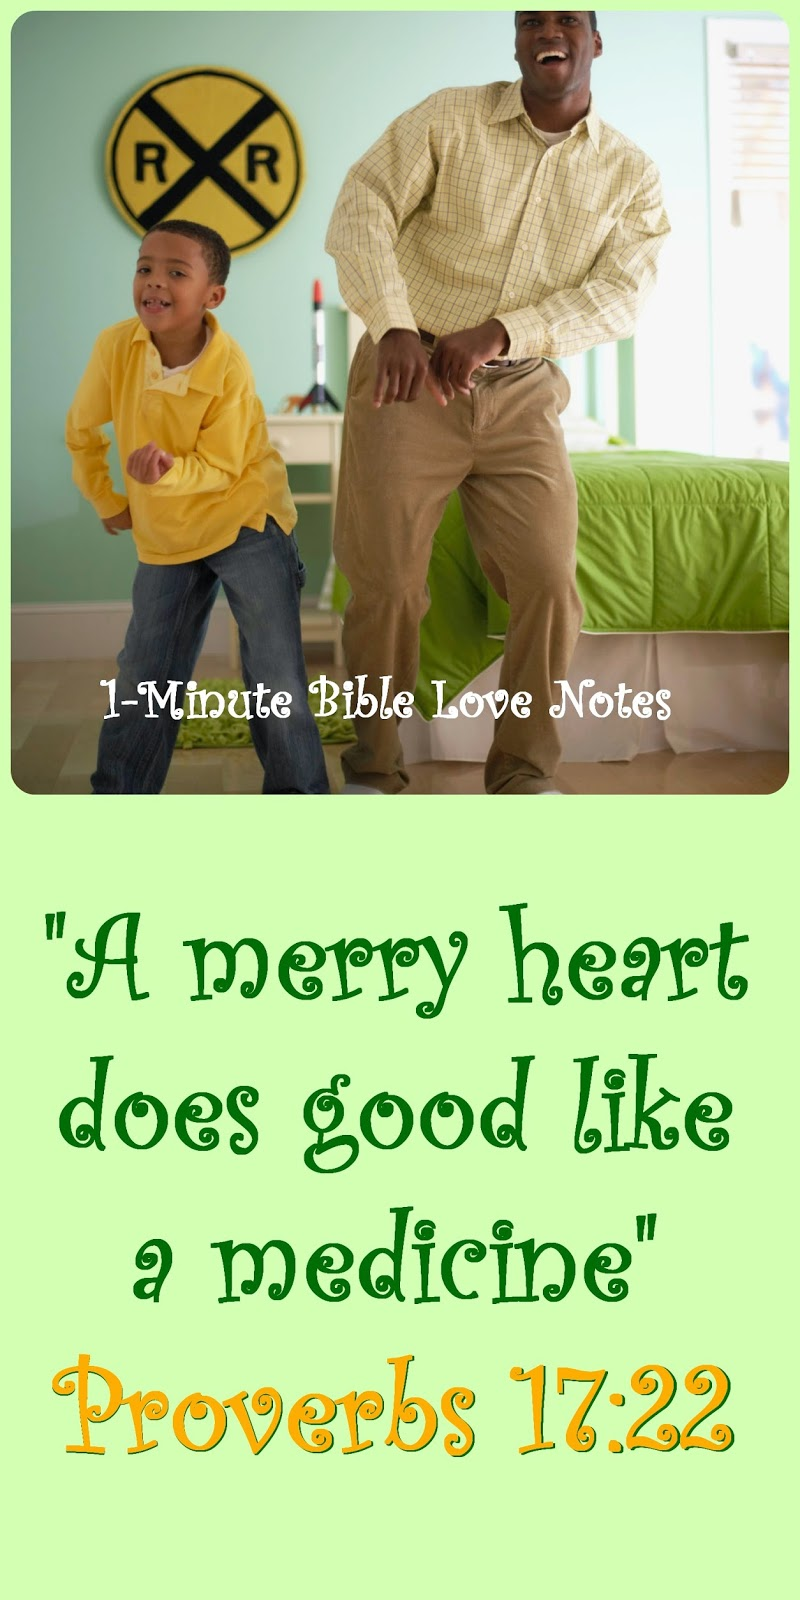 Merry heart, Proverbs 17:22, laughter healing